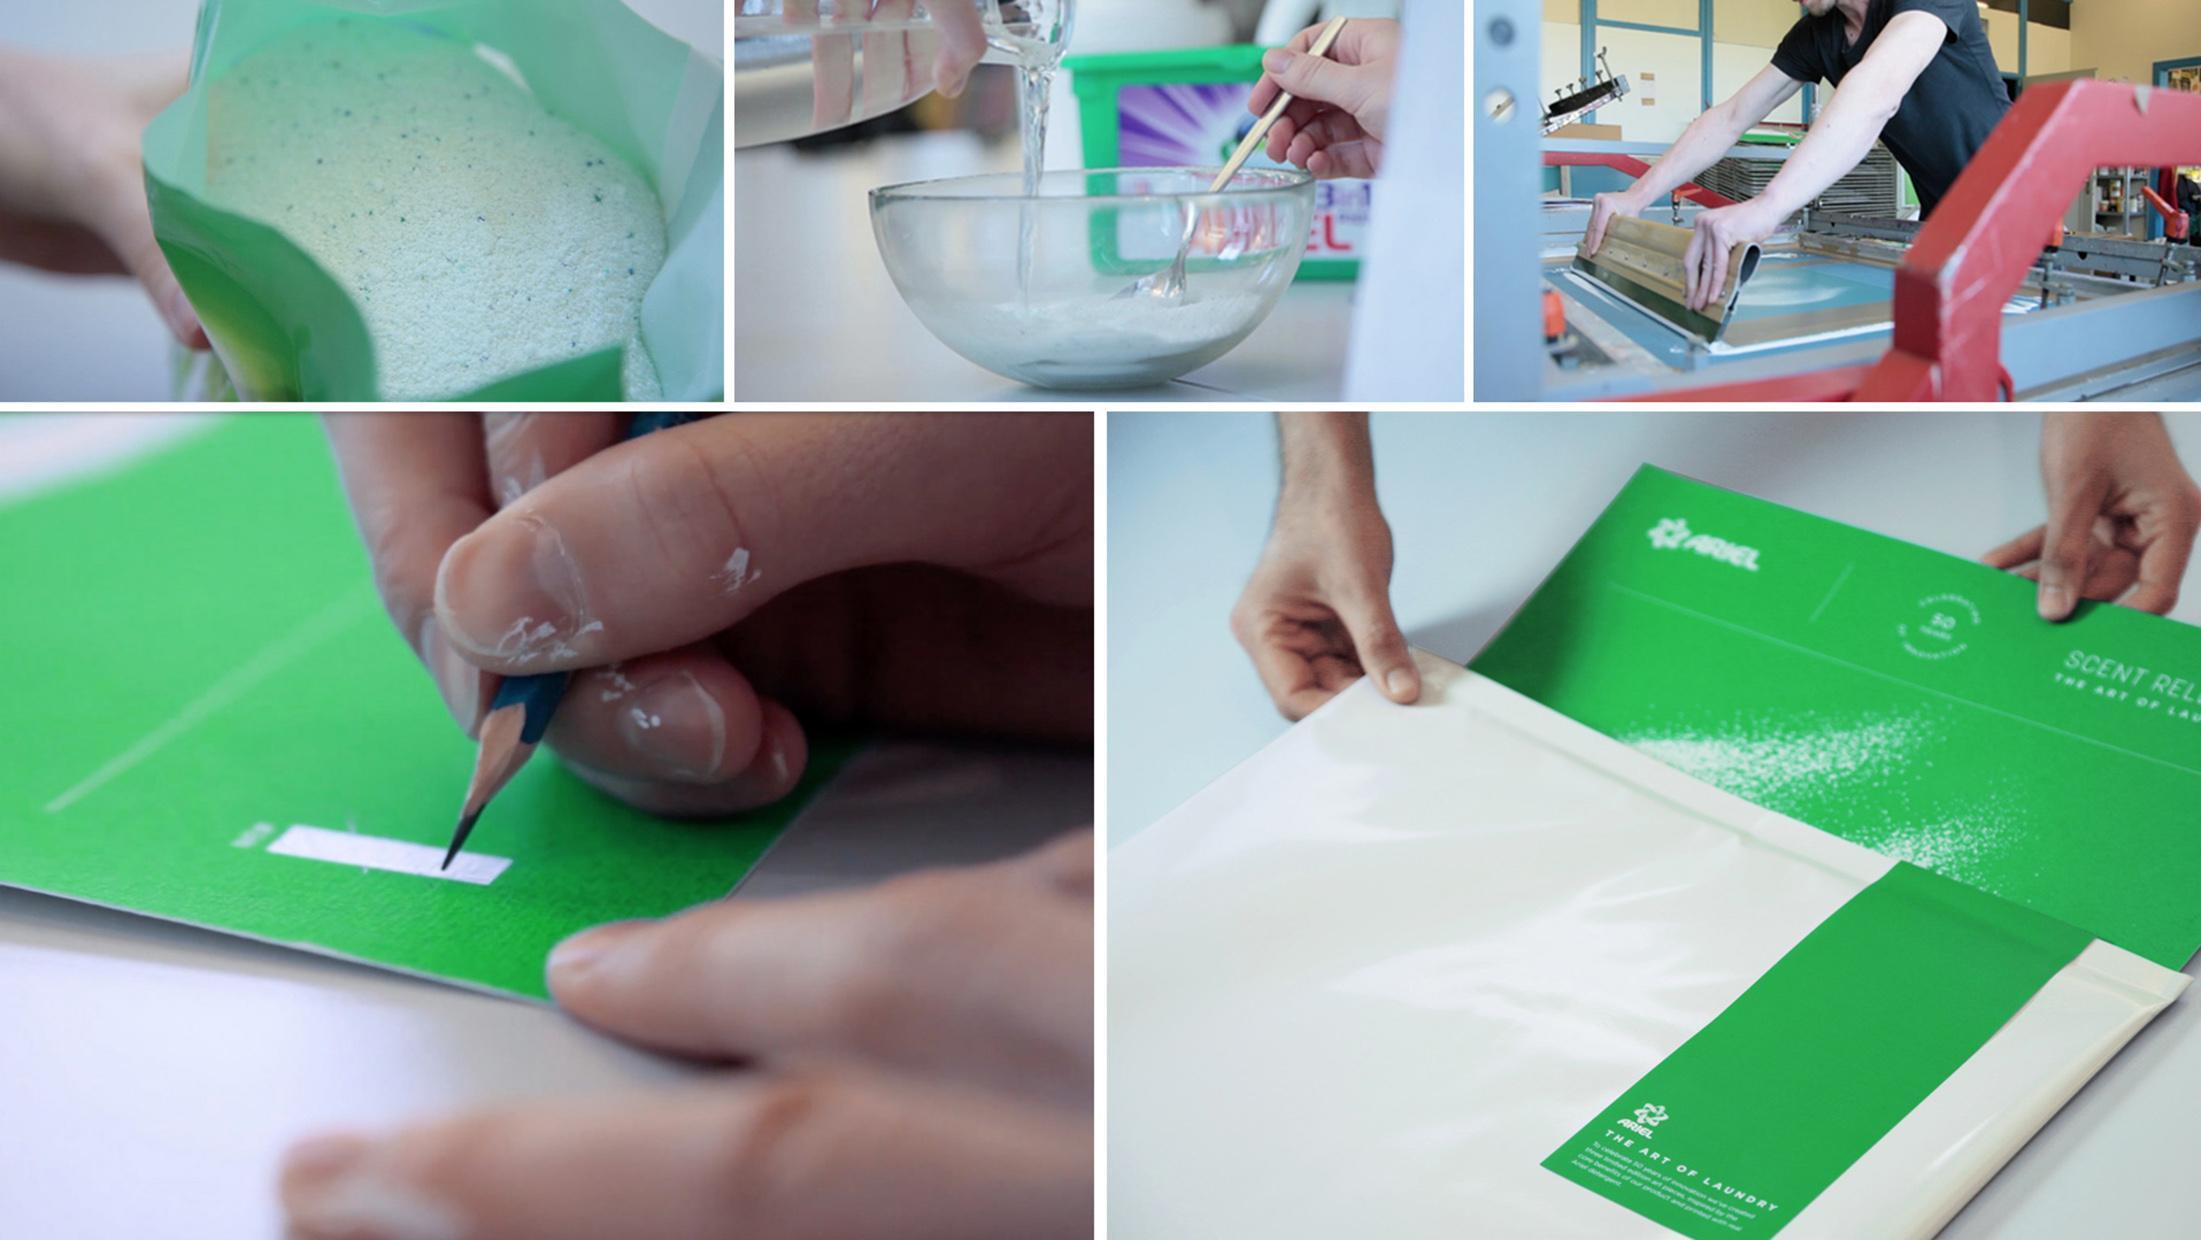 Art_of_laundry_Process.jpg